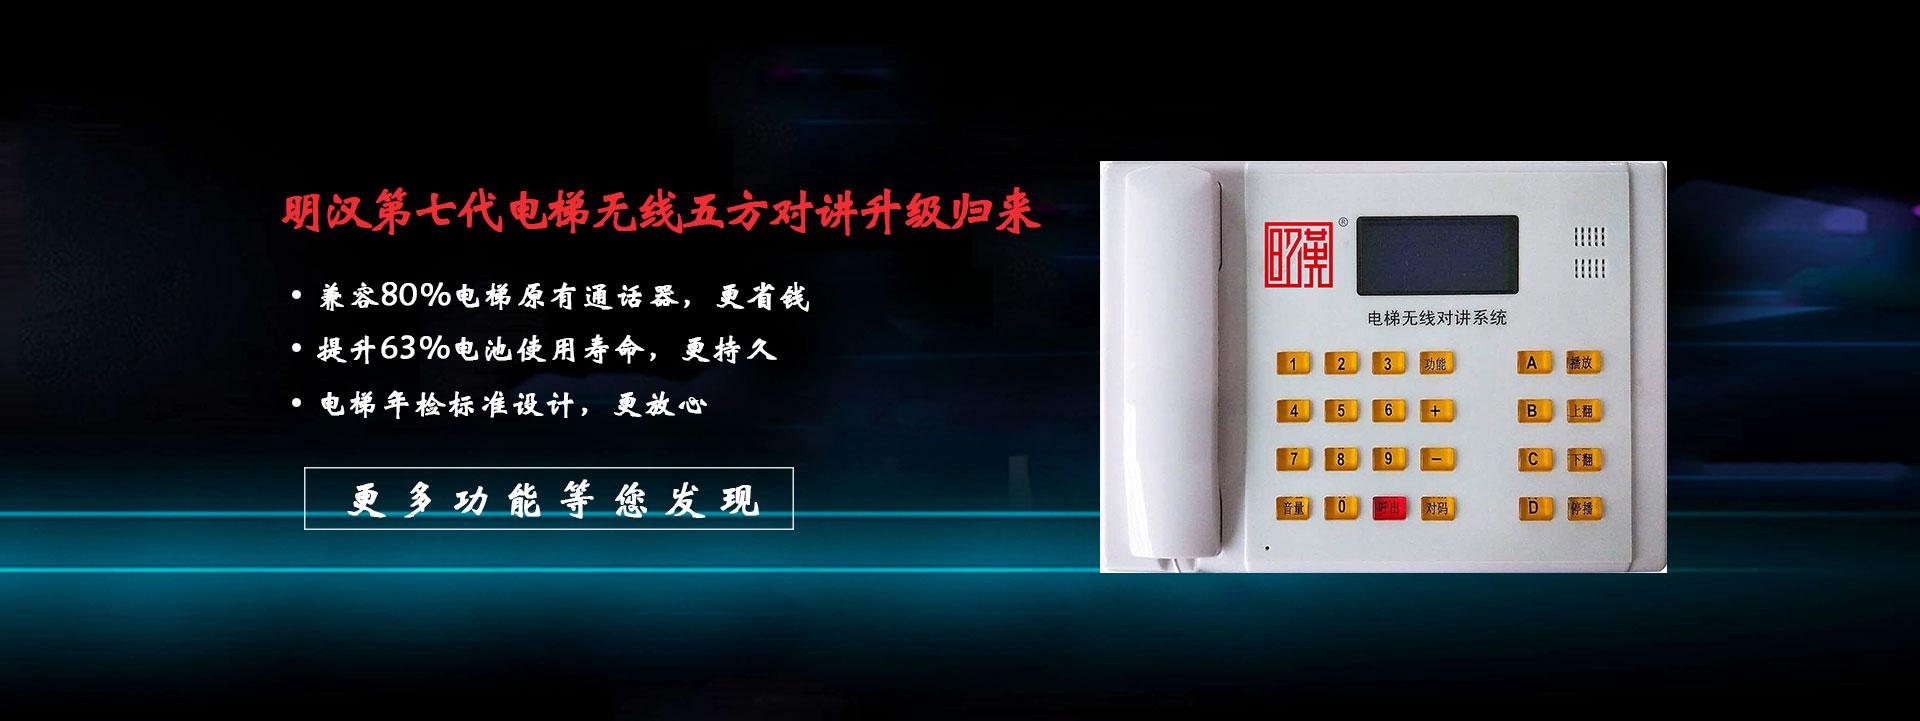 Shenzhen Minghan Technology Co., Ltd.